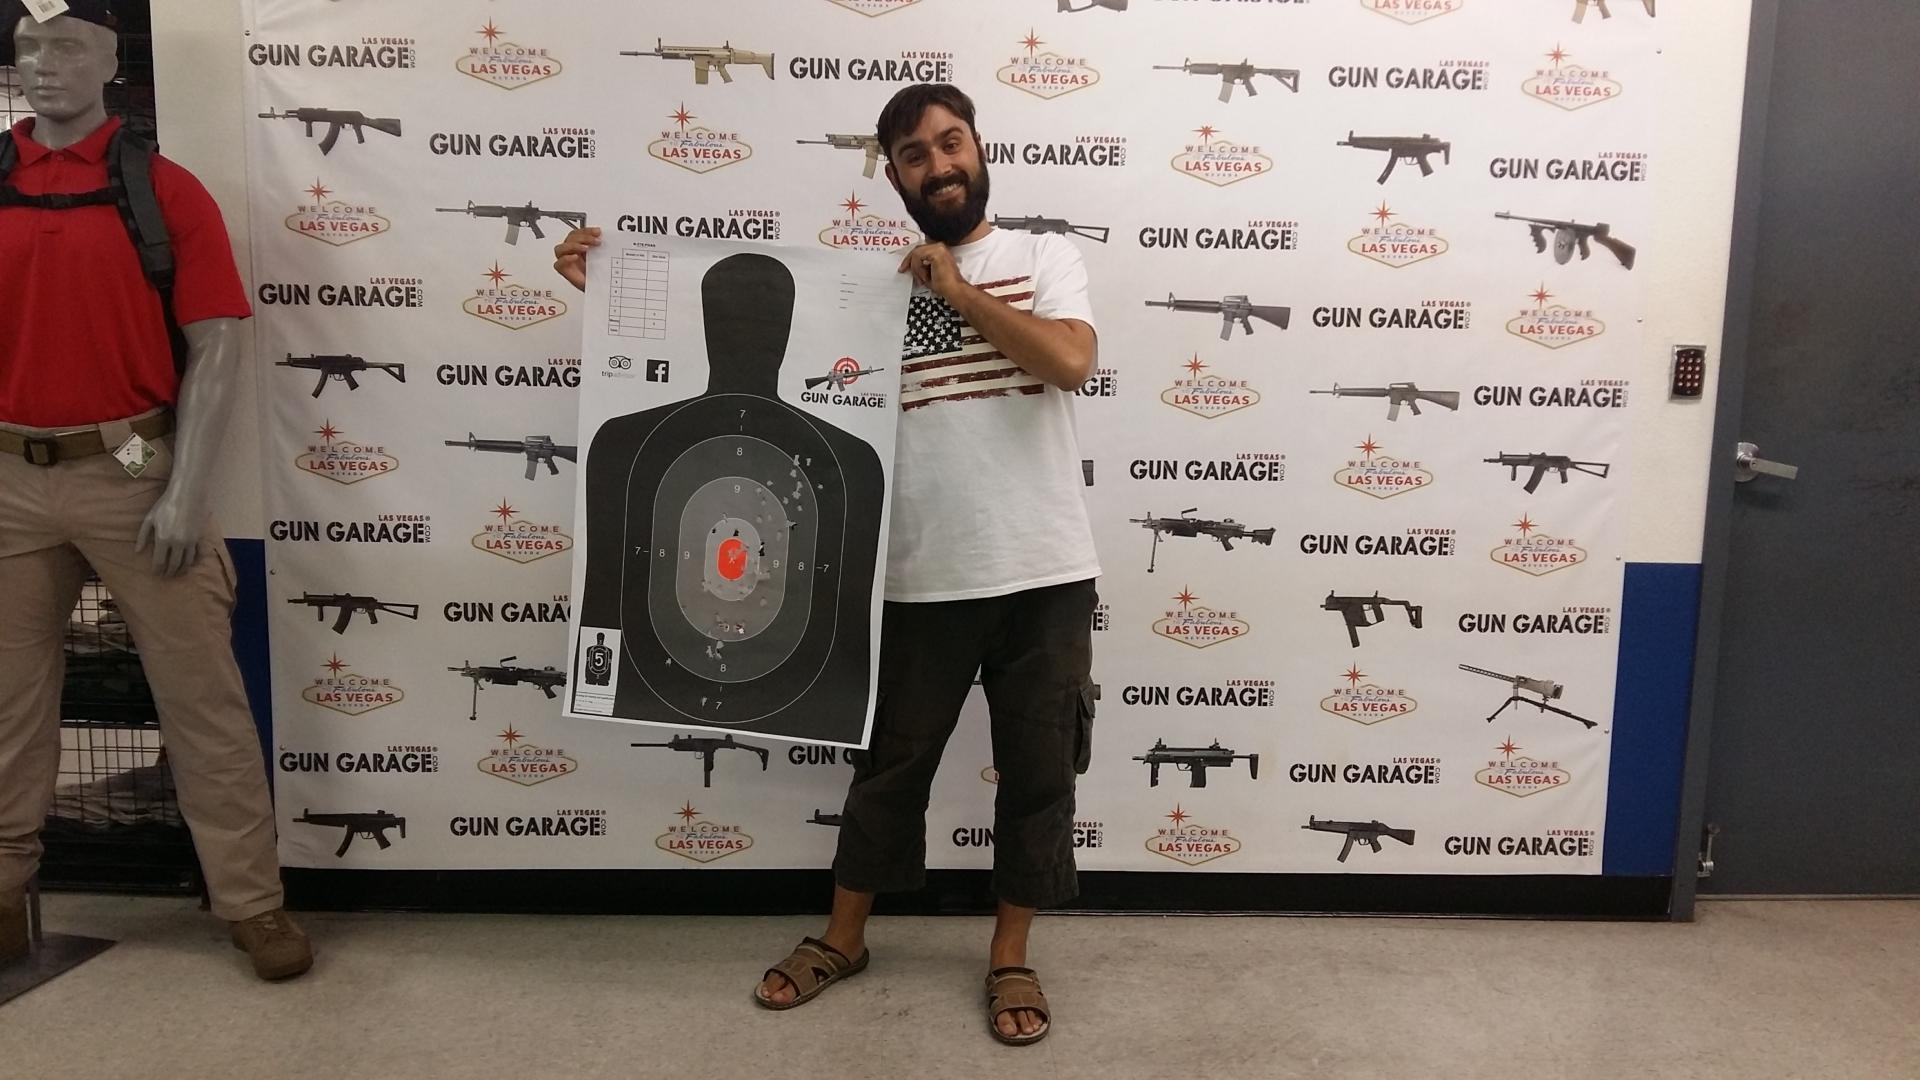 Gun Garaje Las Vegas